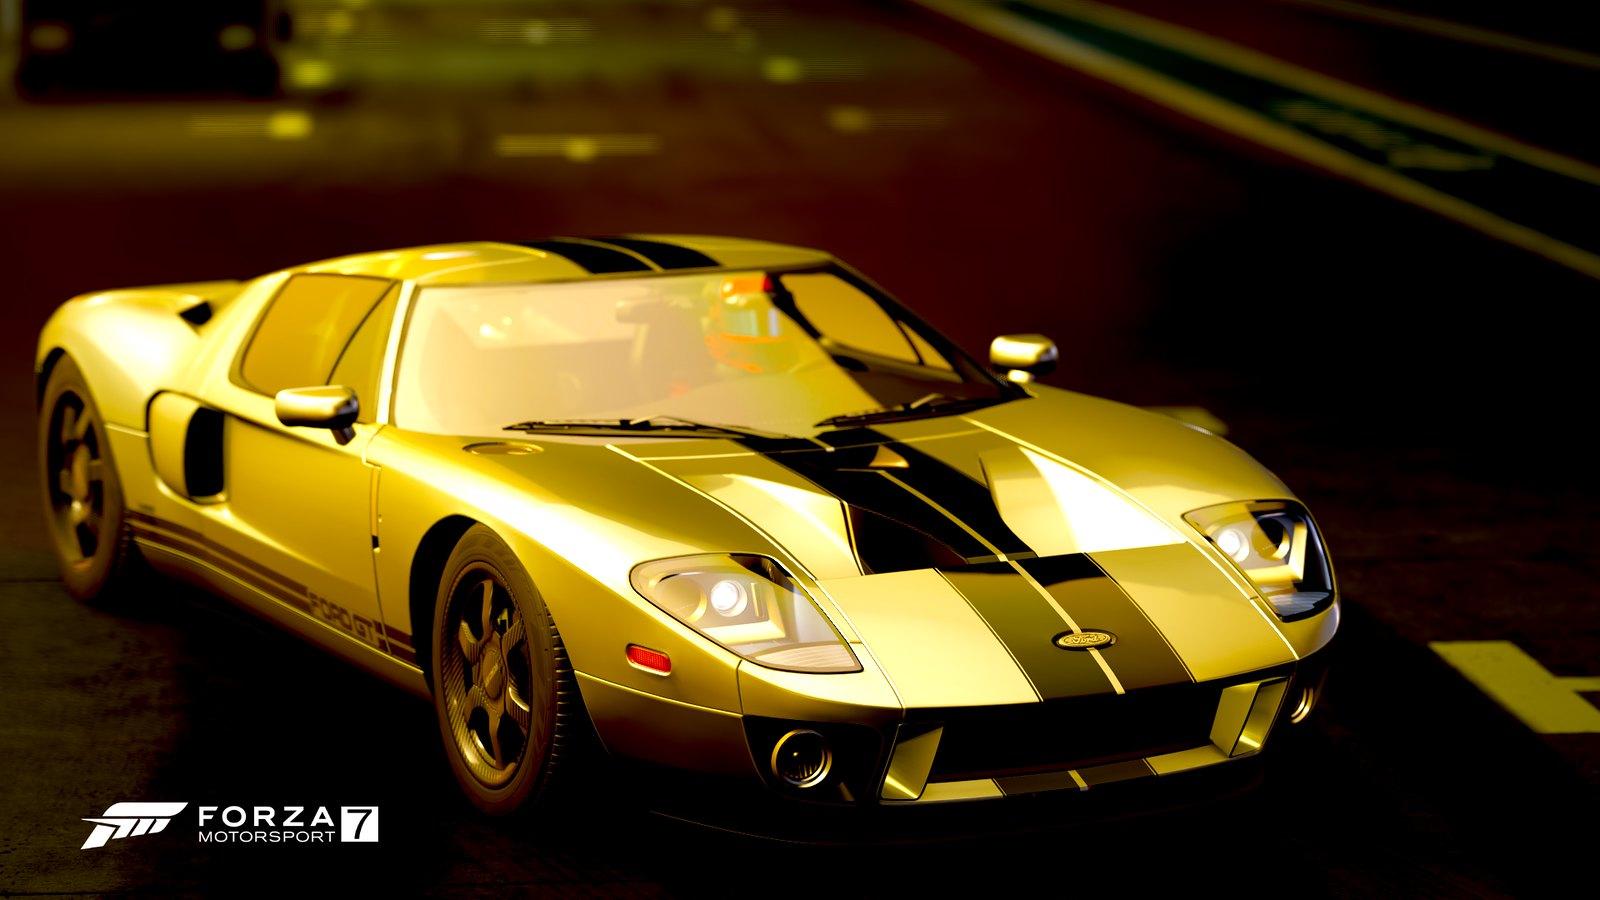 24737035447_46cbc73a19_h ForzaMotorsport.fr